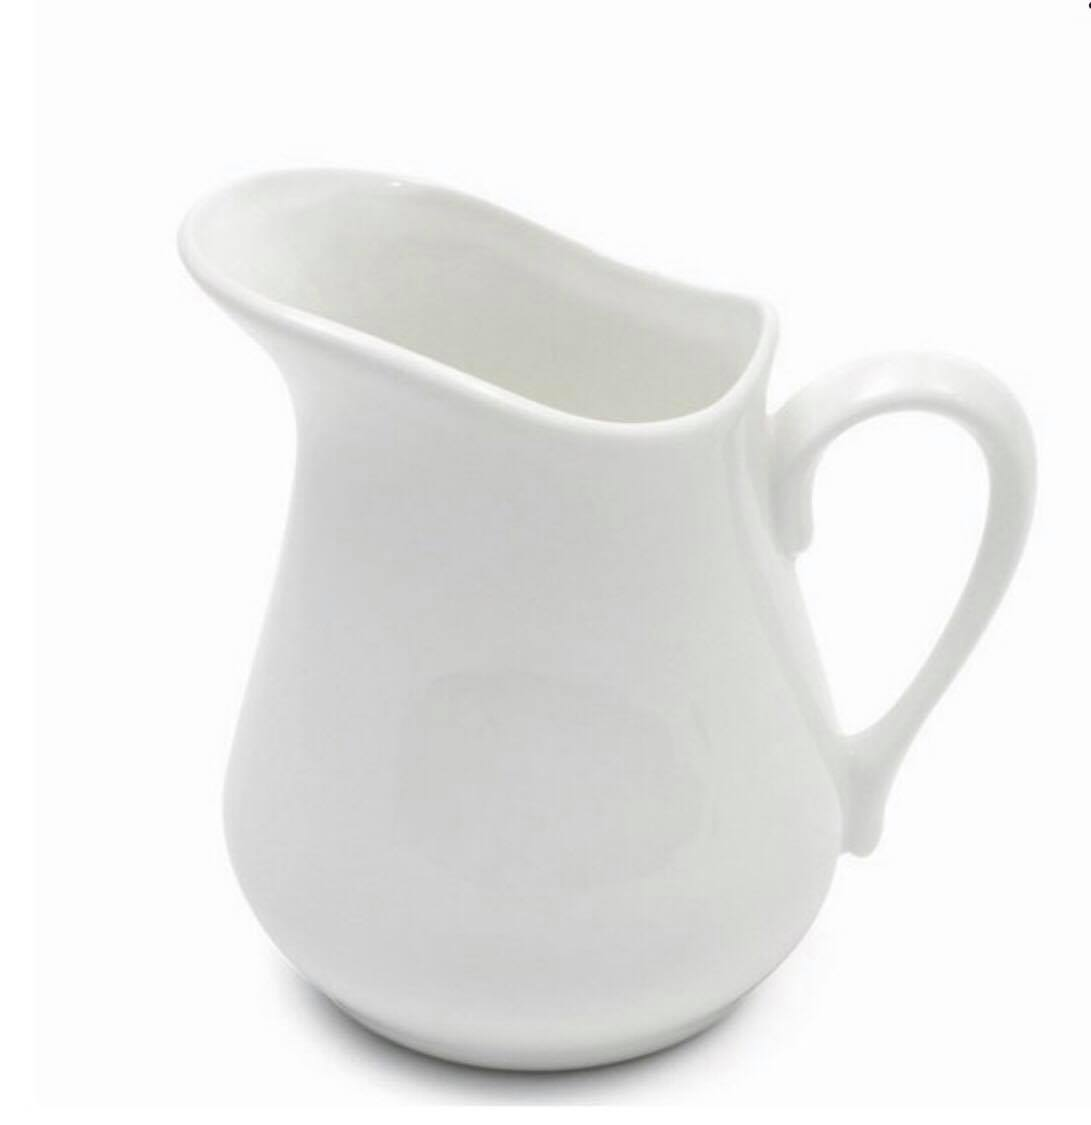 Classic white pitcher